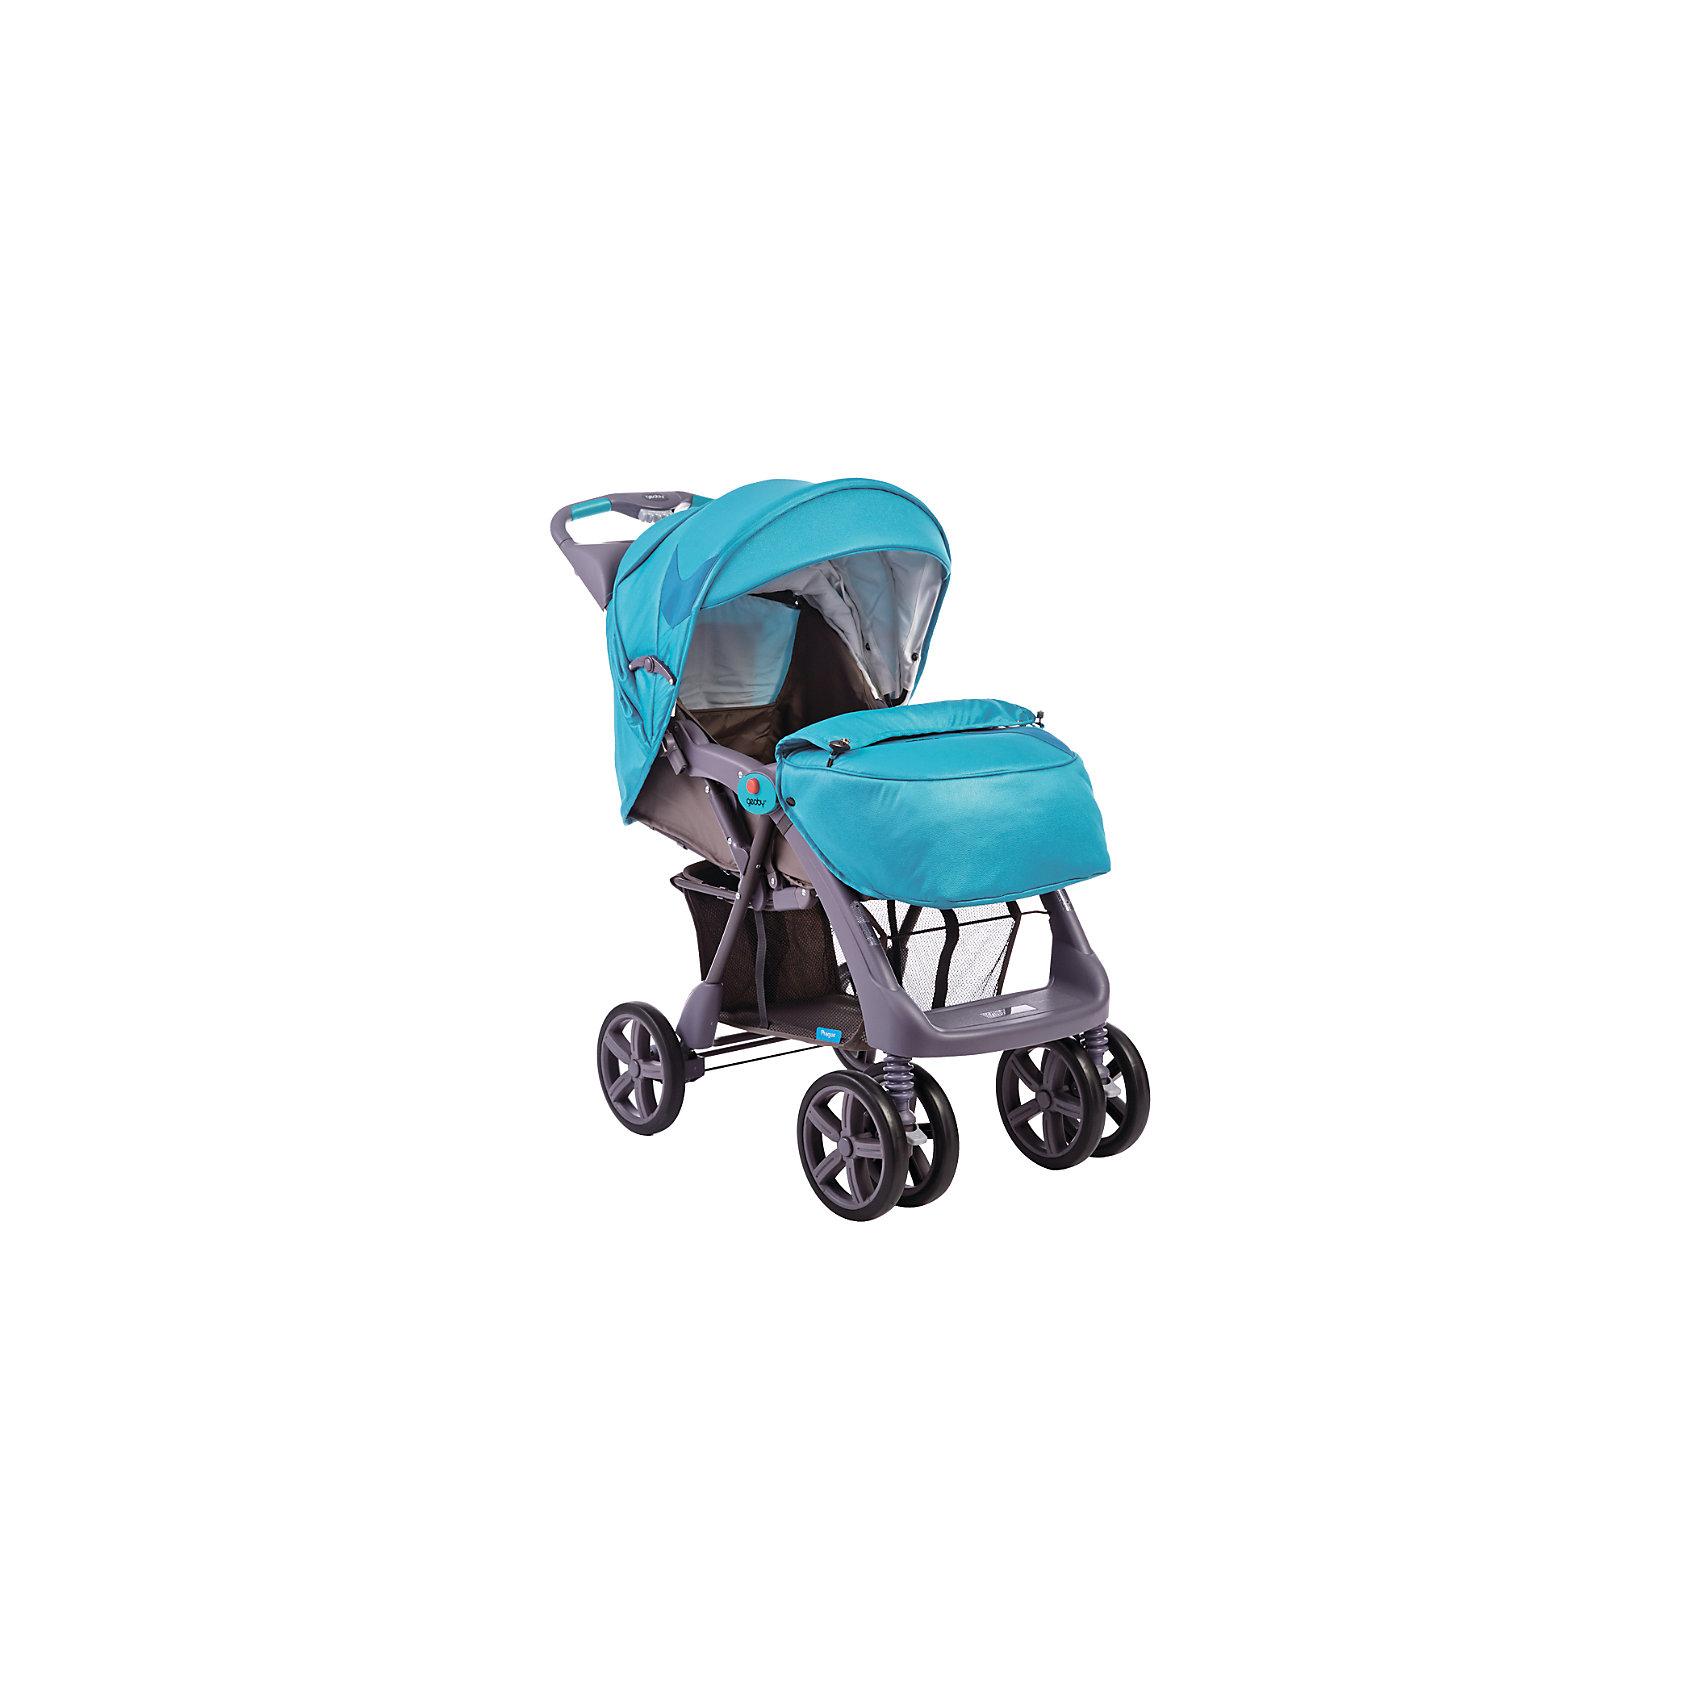 Прогулочная коляска C879CR (RZZY), Geoby, сиреневый/фиолетовый